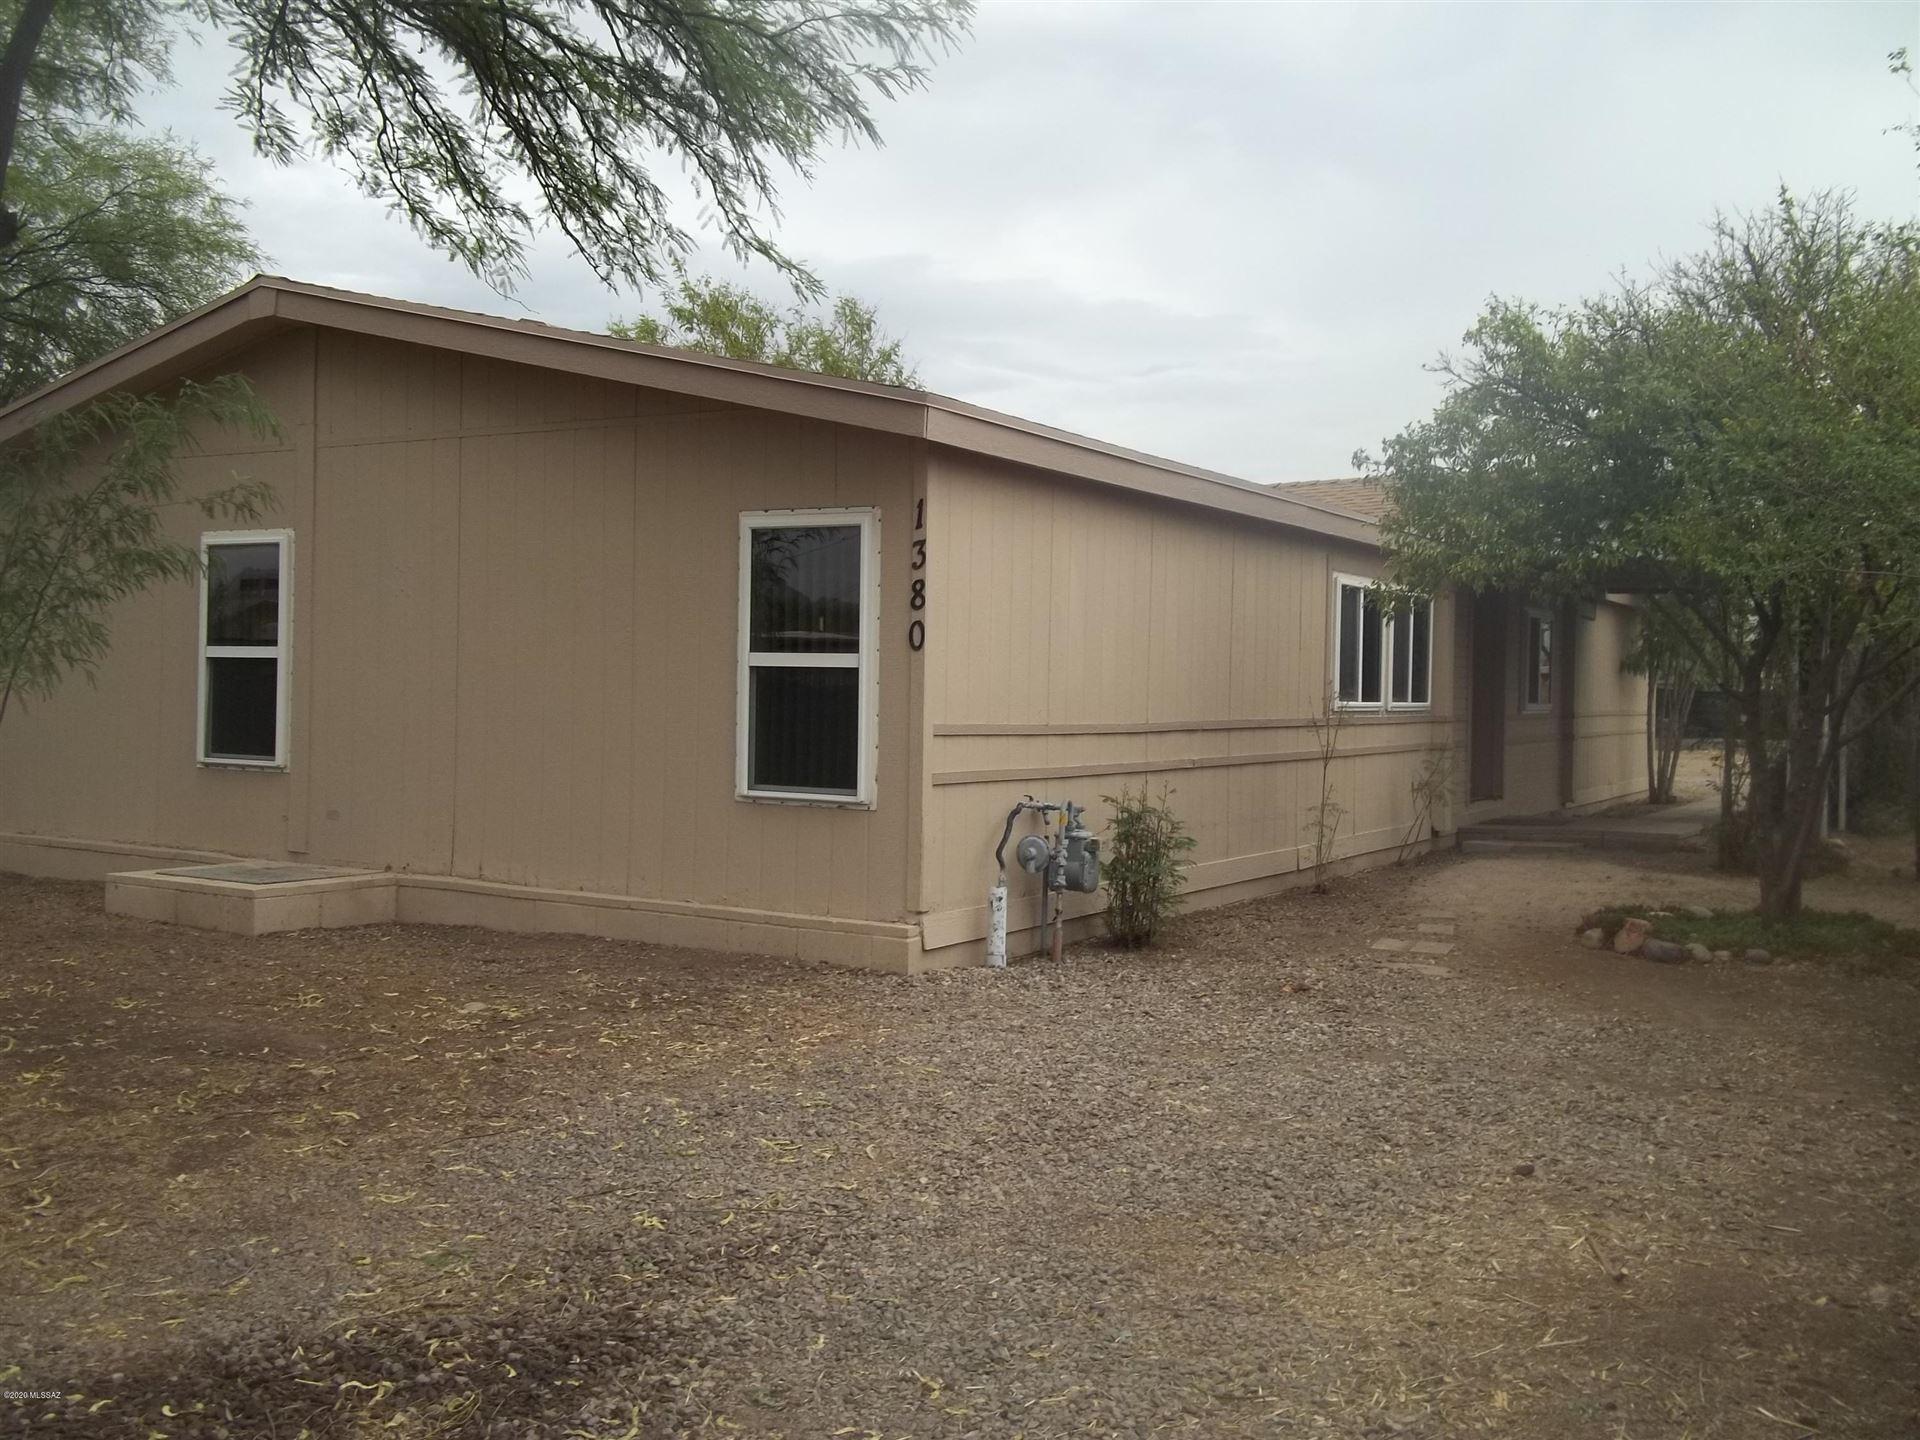 1380 W El Rio Drive, Tucson, AZ 85745 - MLS#: 22016514